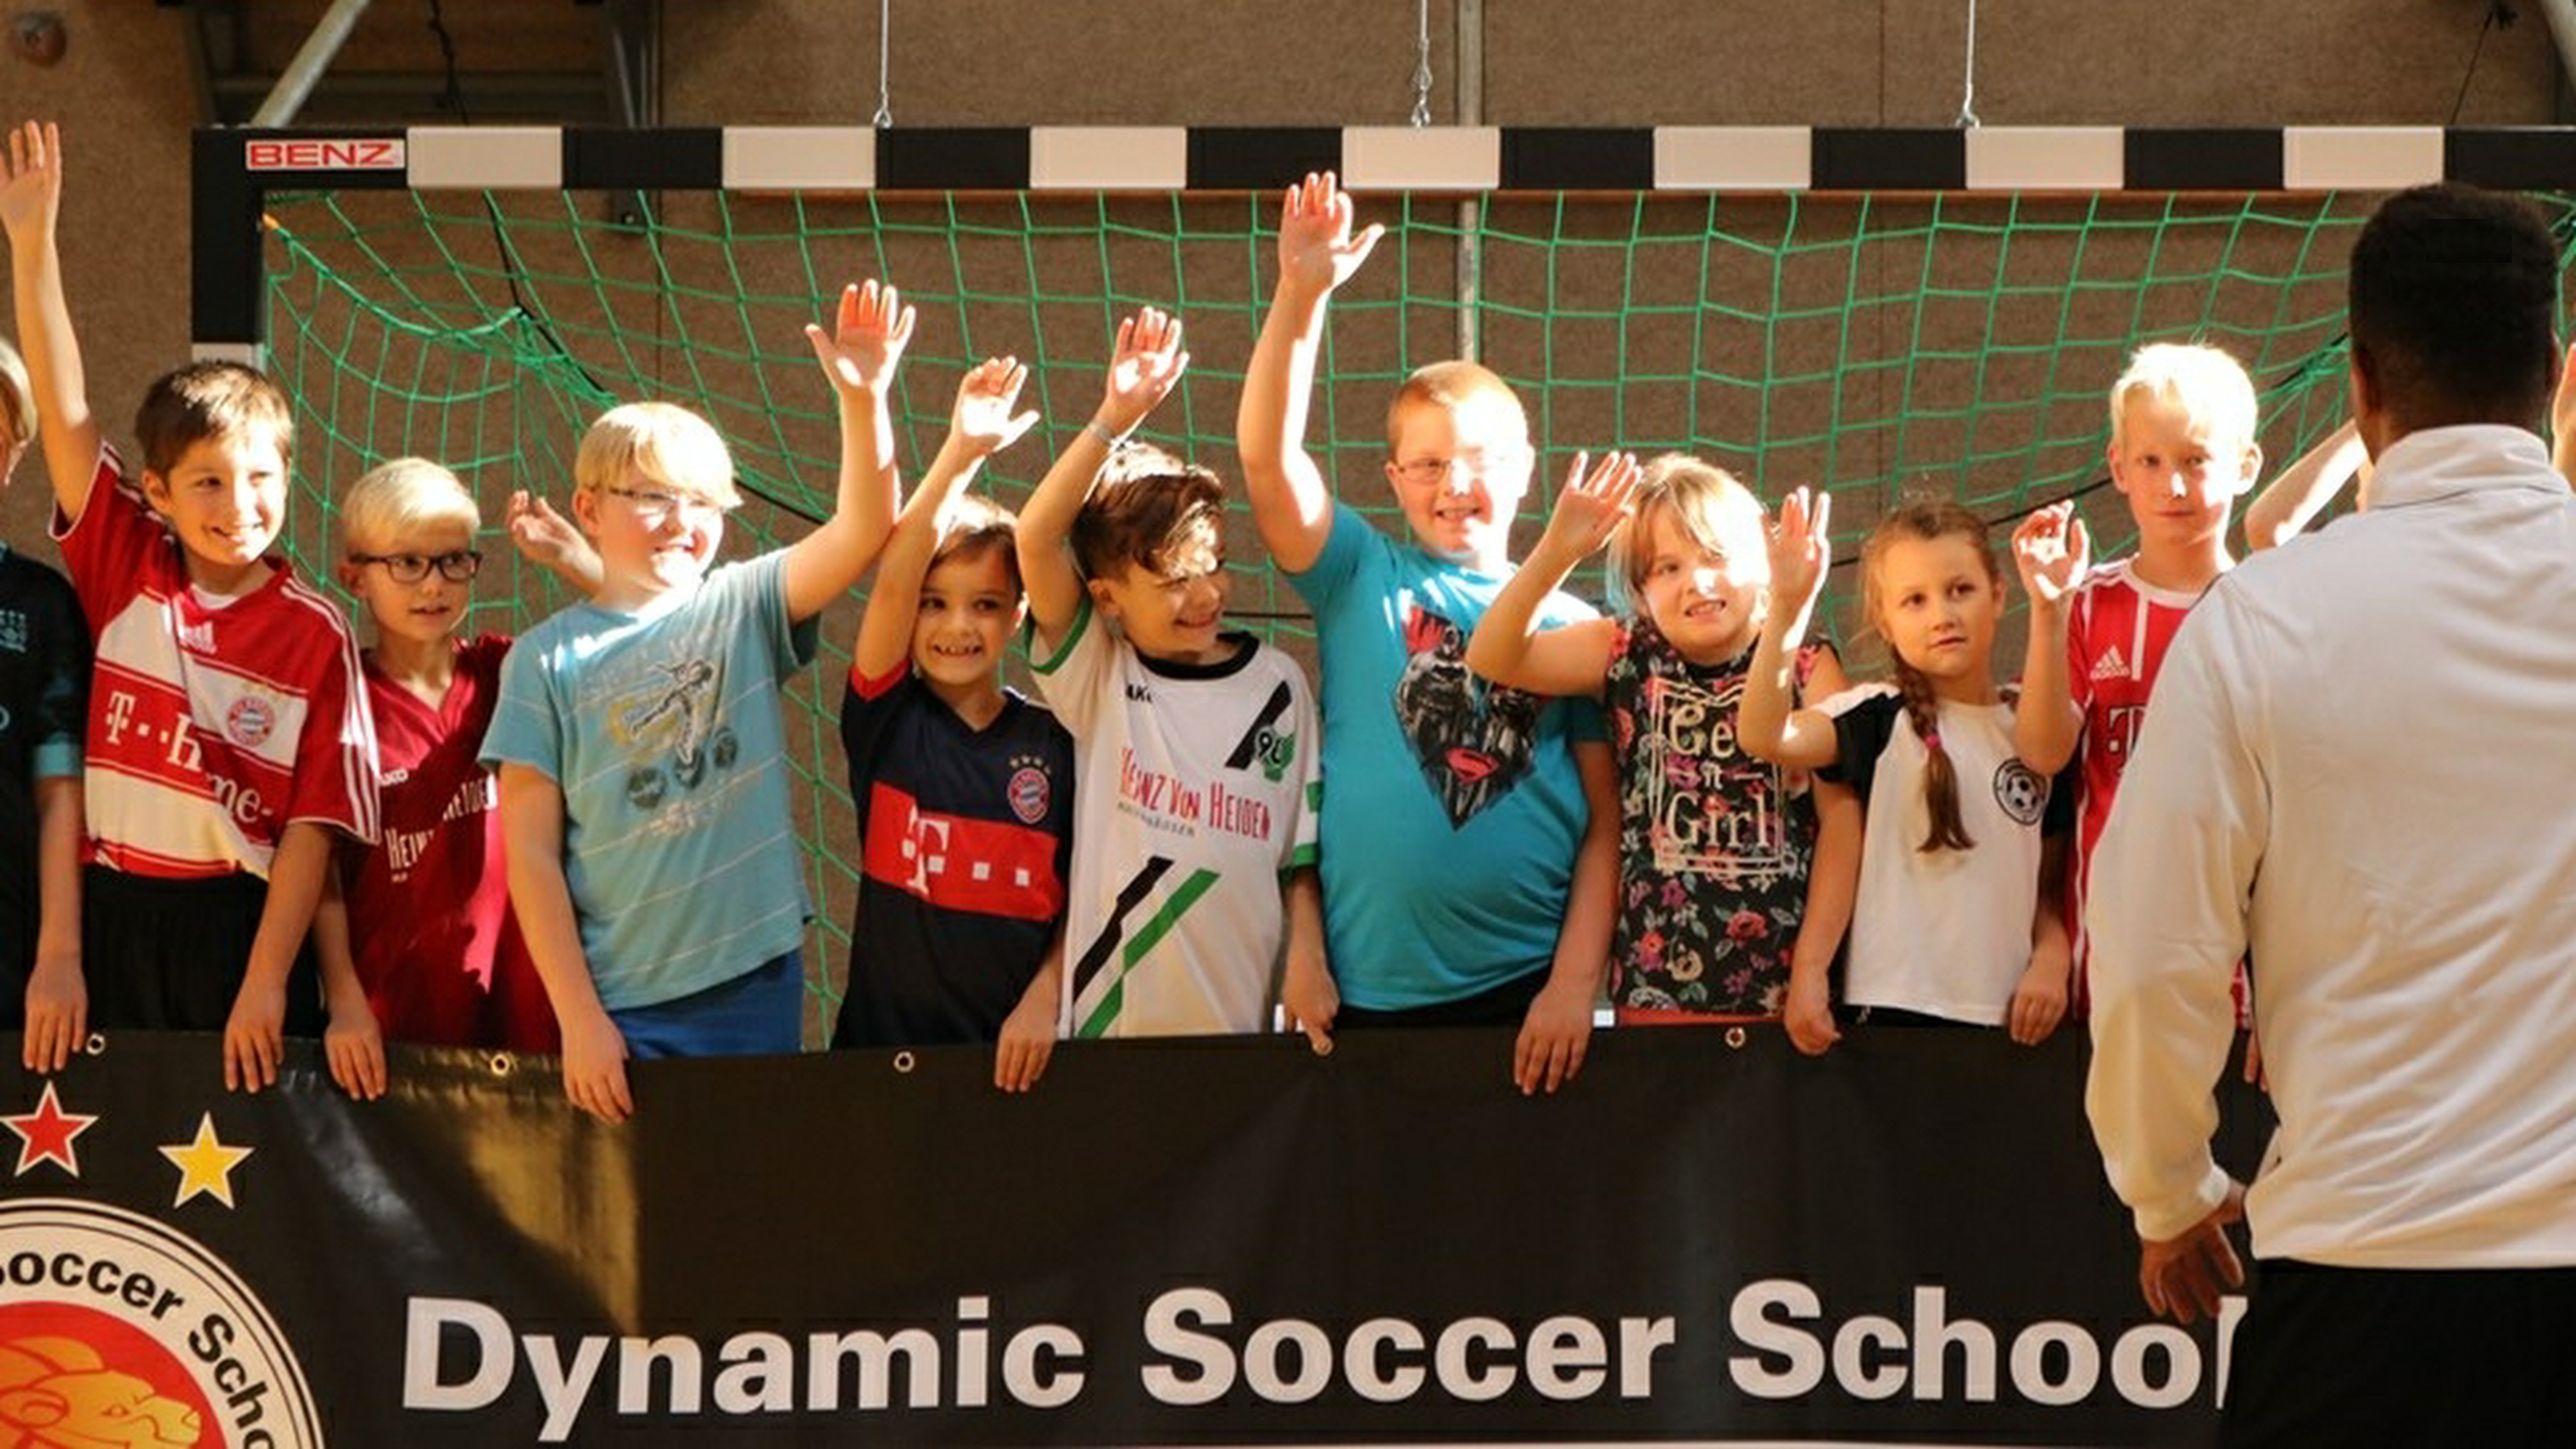 Dynamic-Soccer-School_Fußballschule_Fußballcamp (41)